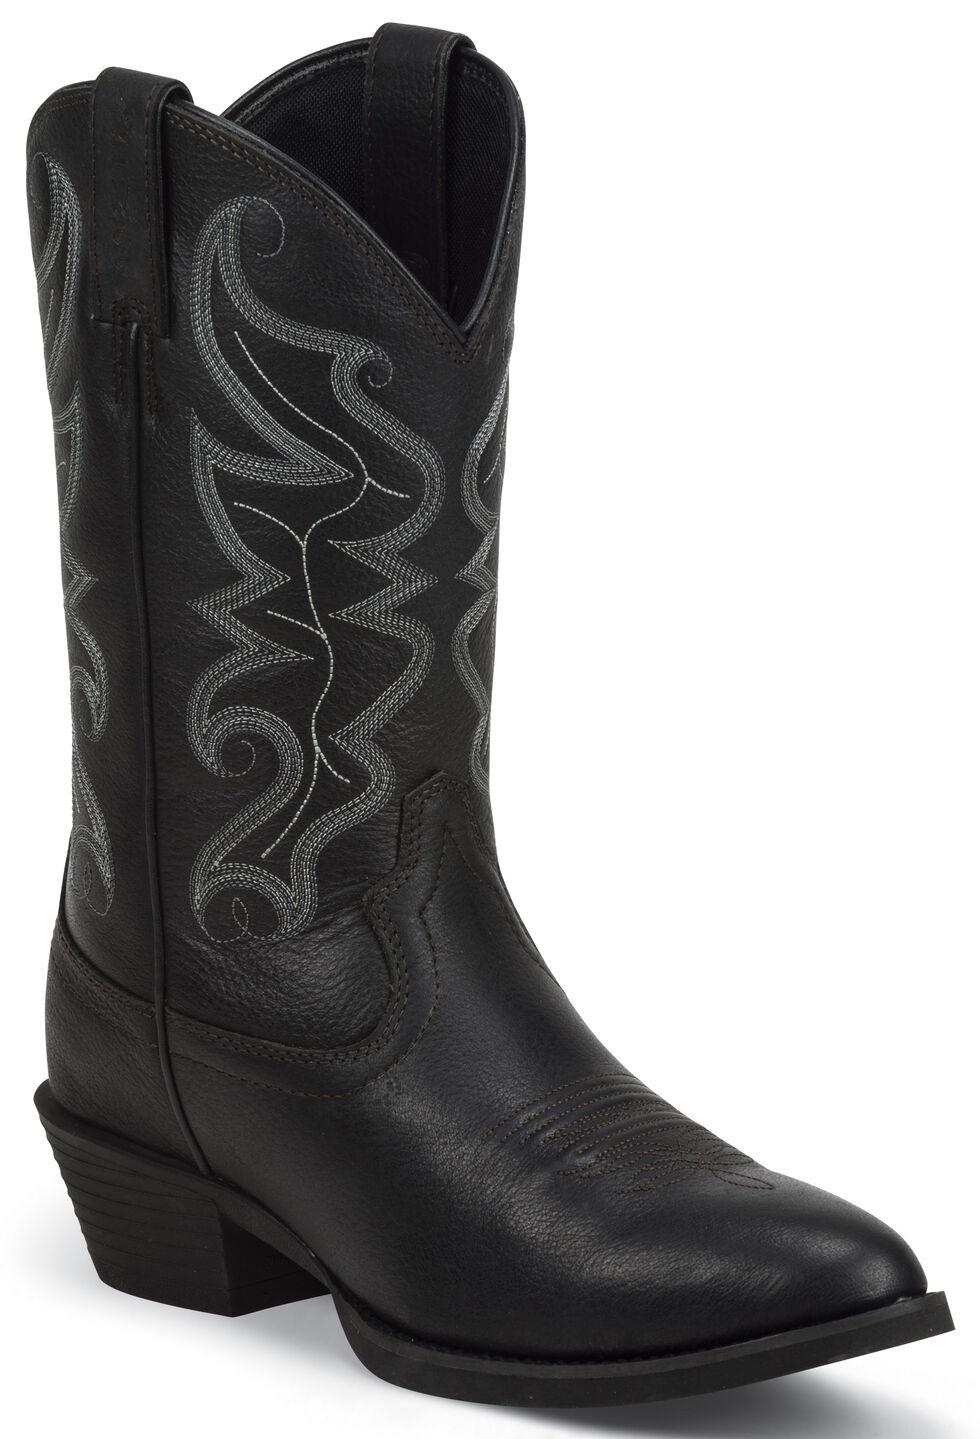 Justin Men's All Star Black Western Boots - Round Toe , Black, hi-res